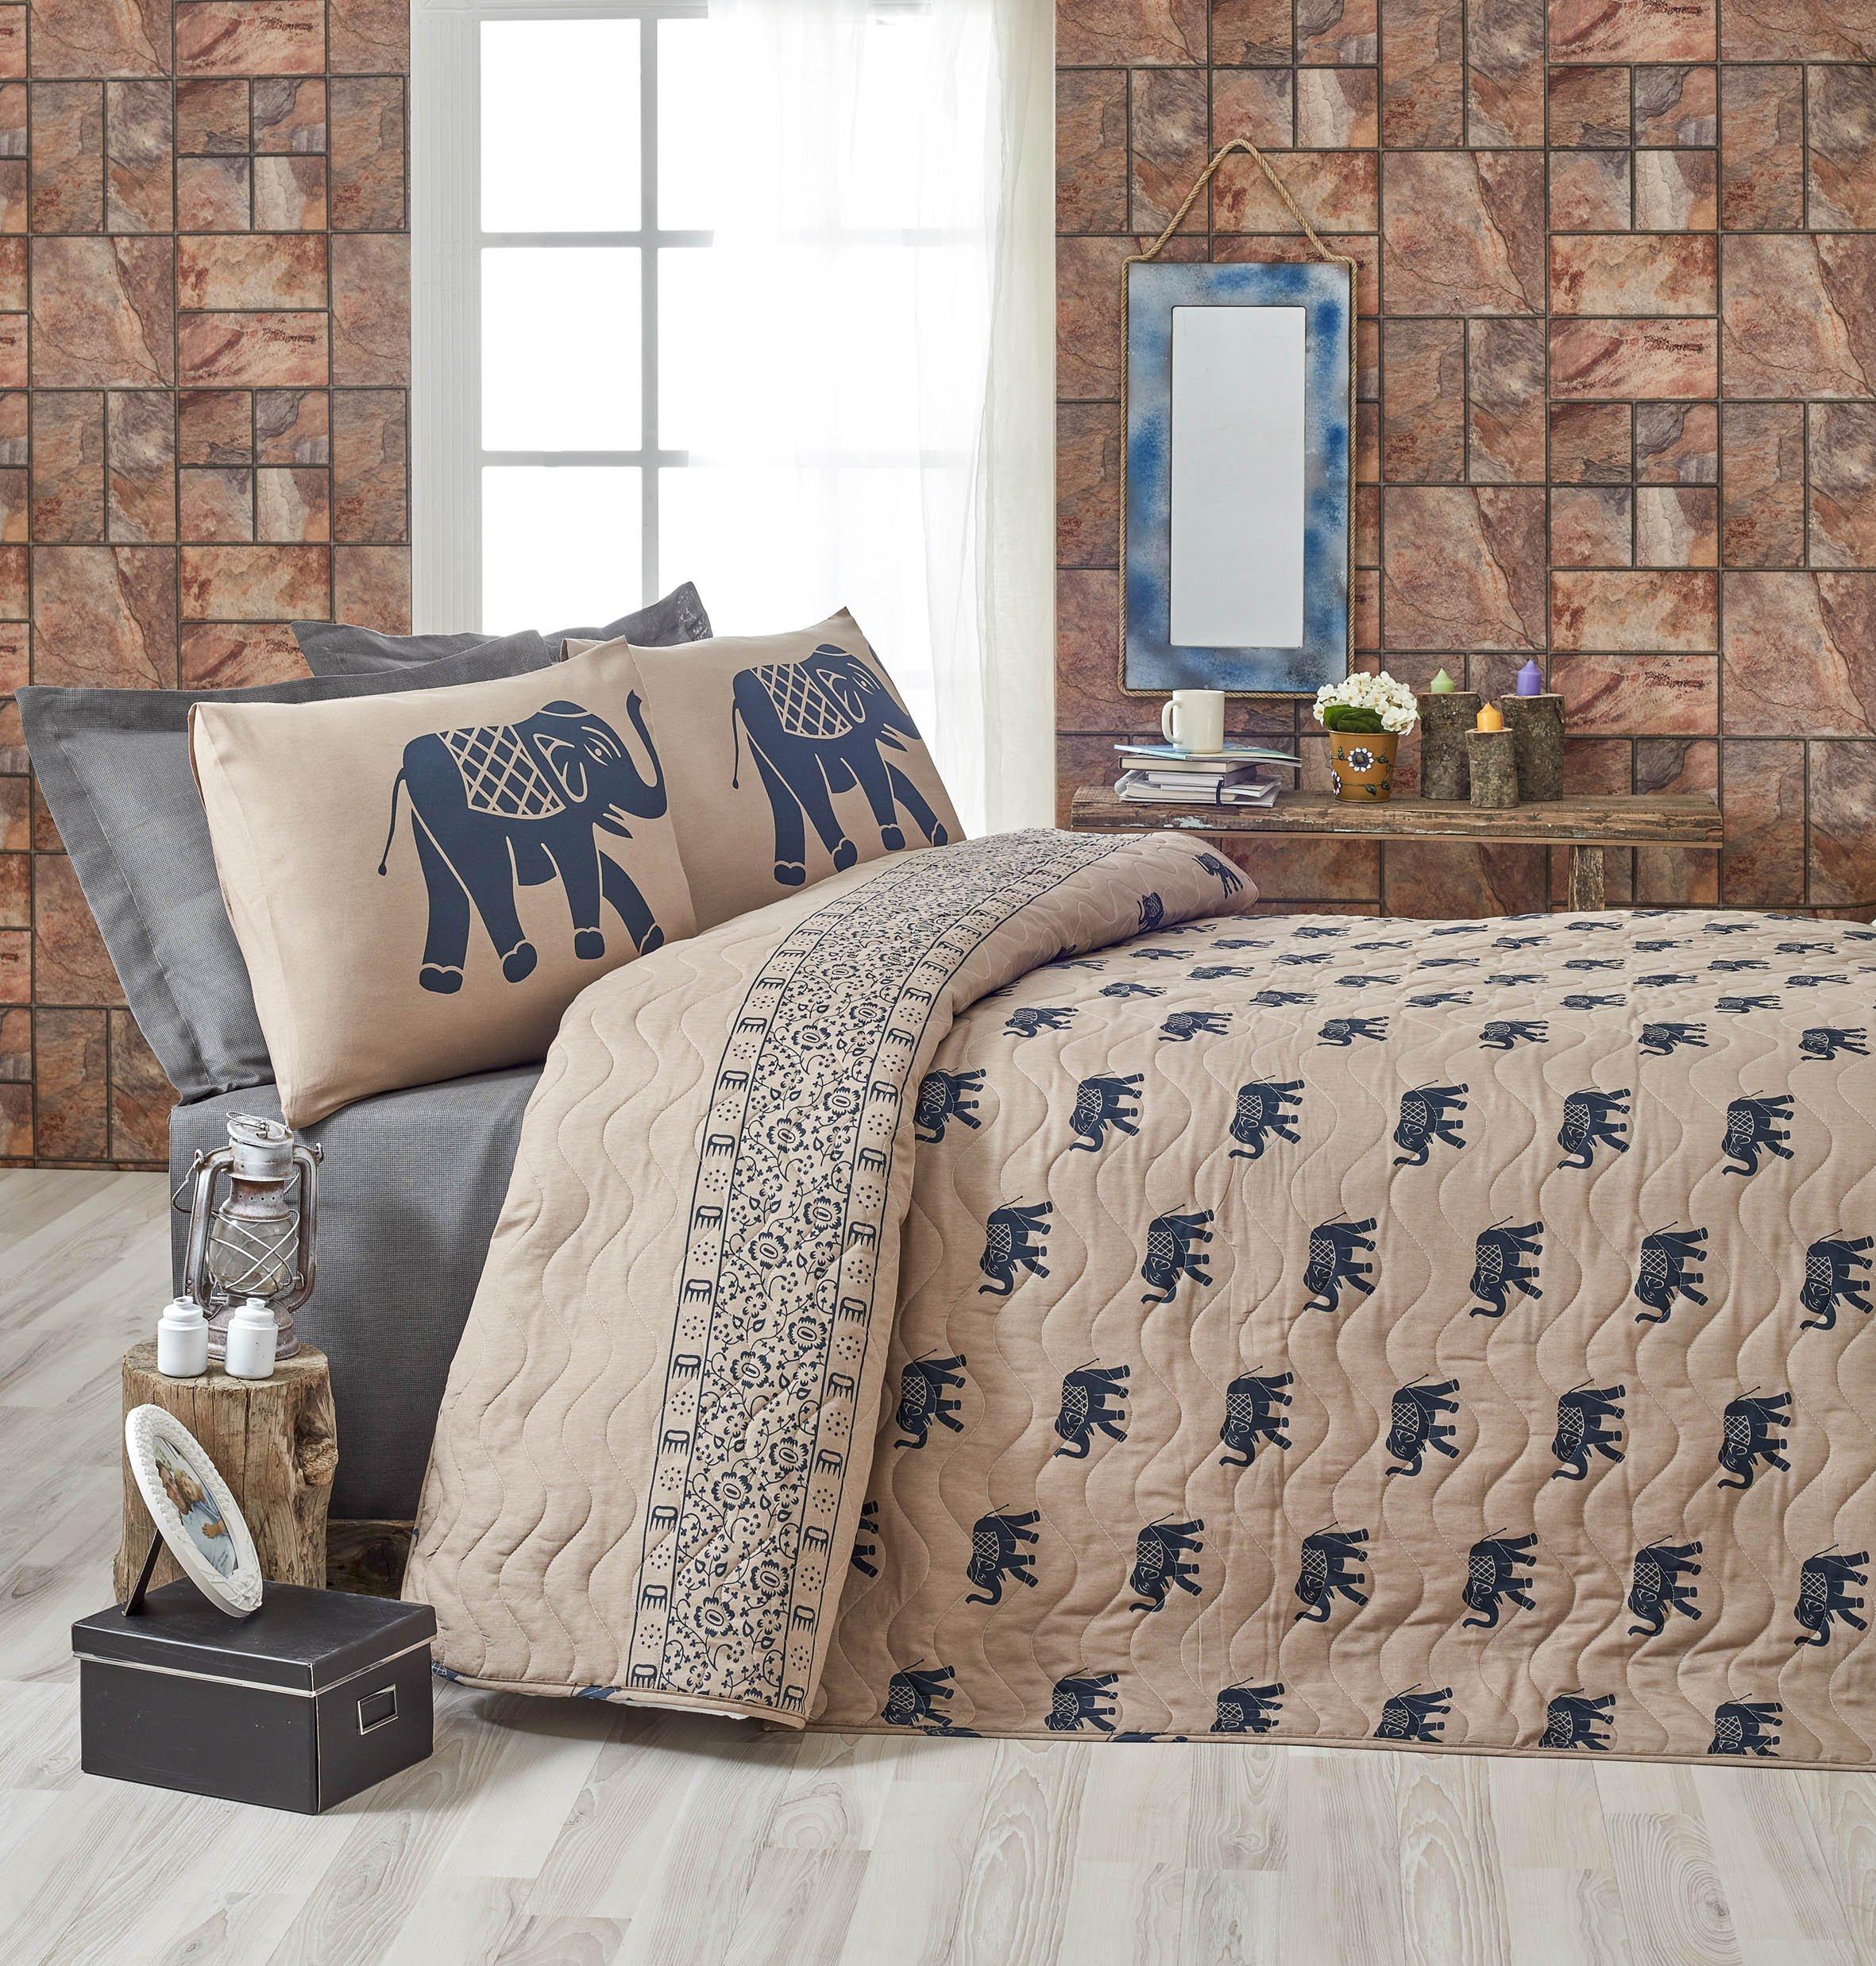 DecoMood Elephant Bedding, Full/Queen Size Bedspread/Coverlet Set, Elephant Themed Girls Boys Bedding, 3 PCS, Blue by DecoMood